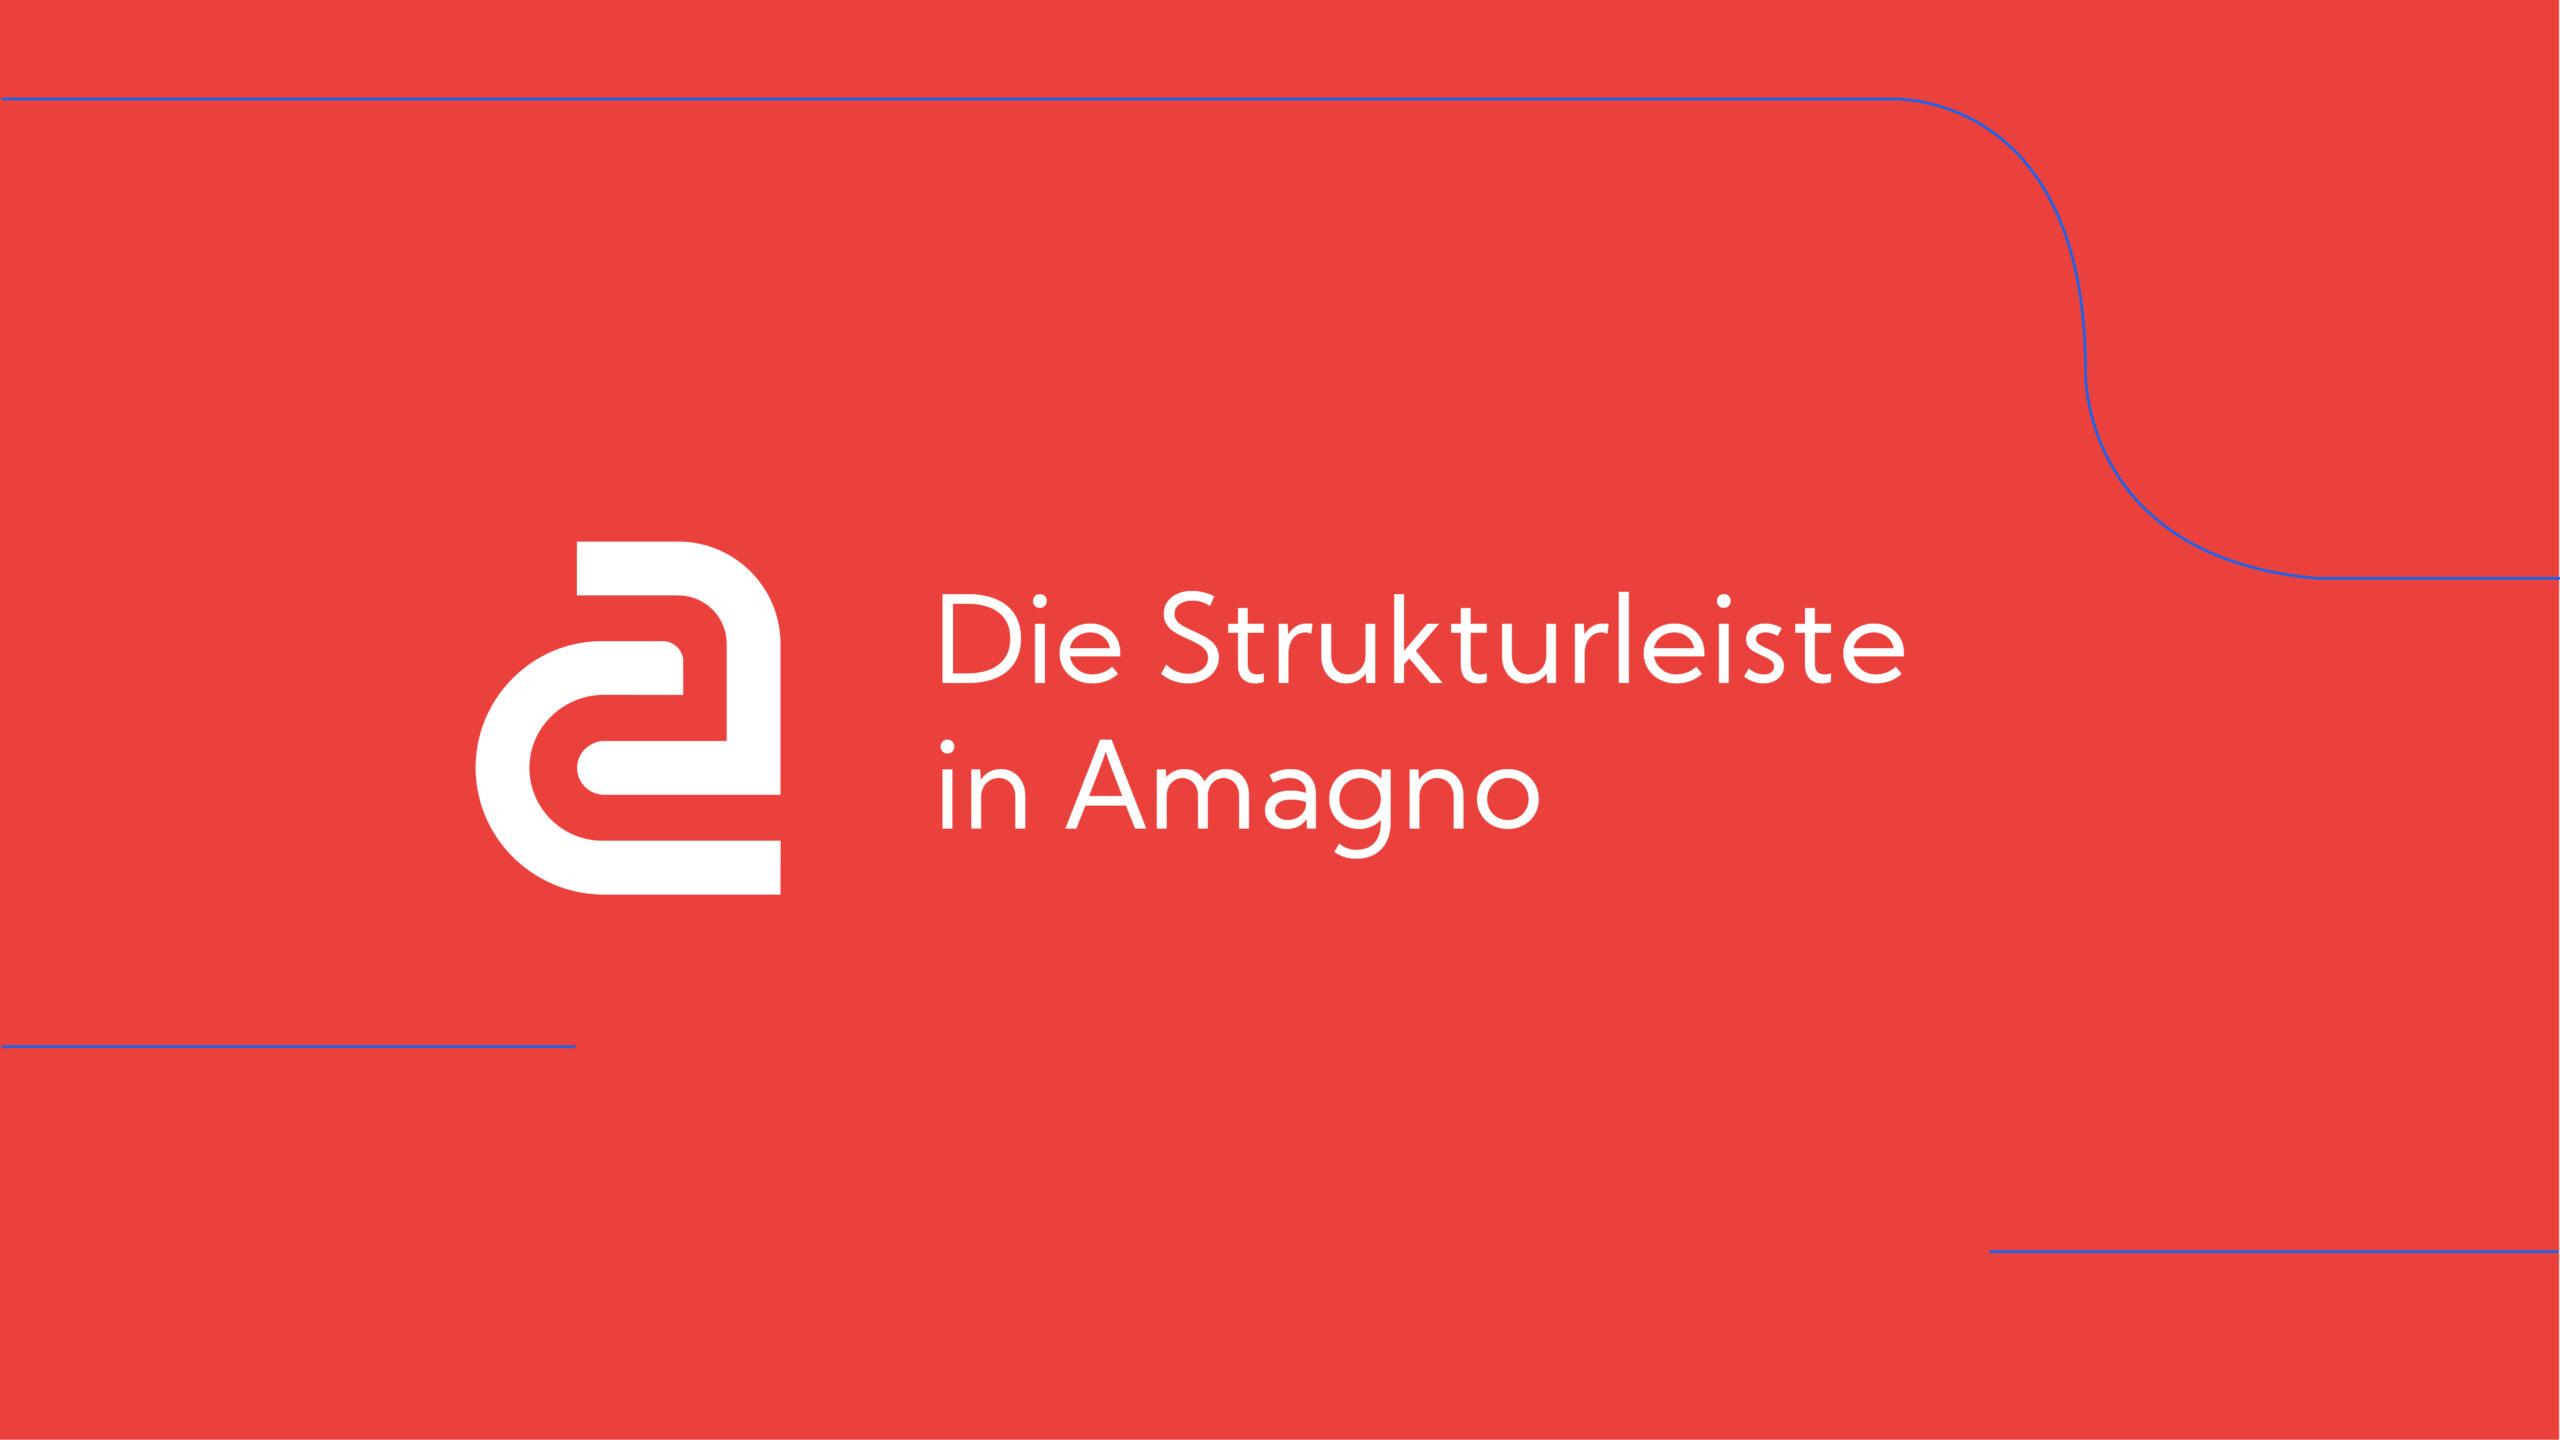 How-To: Amagno Basics – Die Strukturleiste